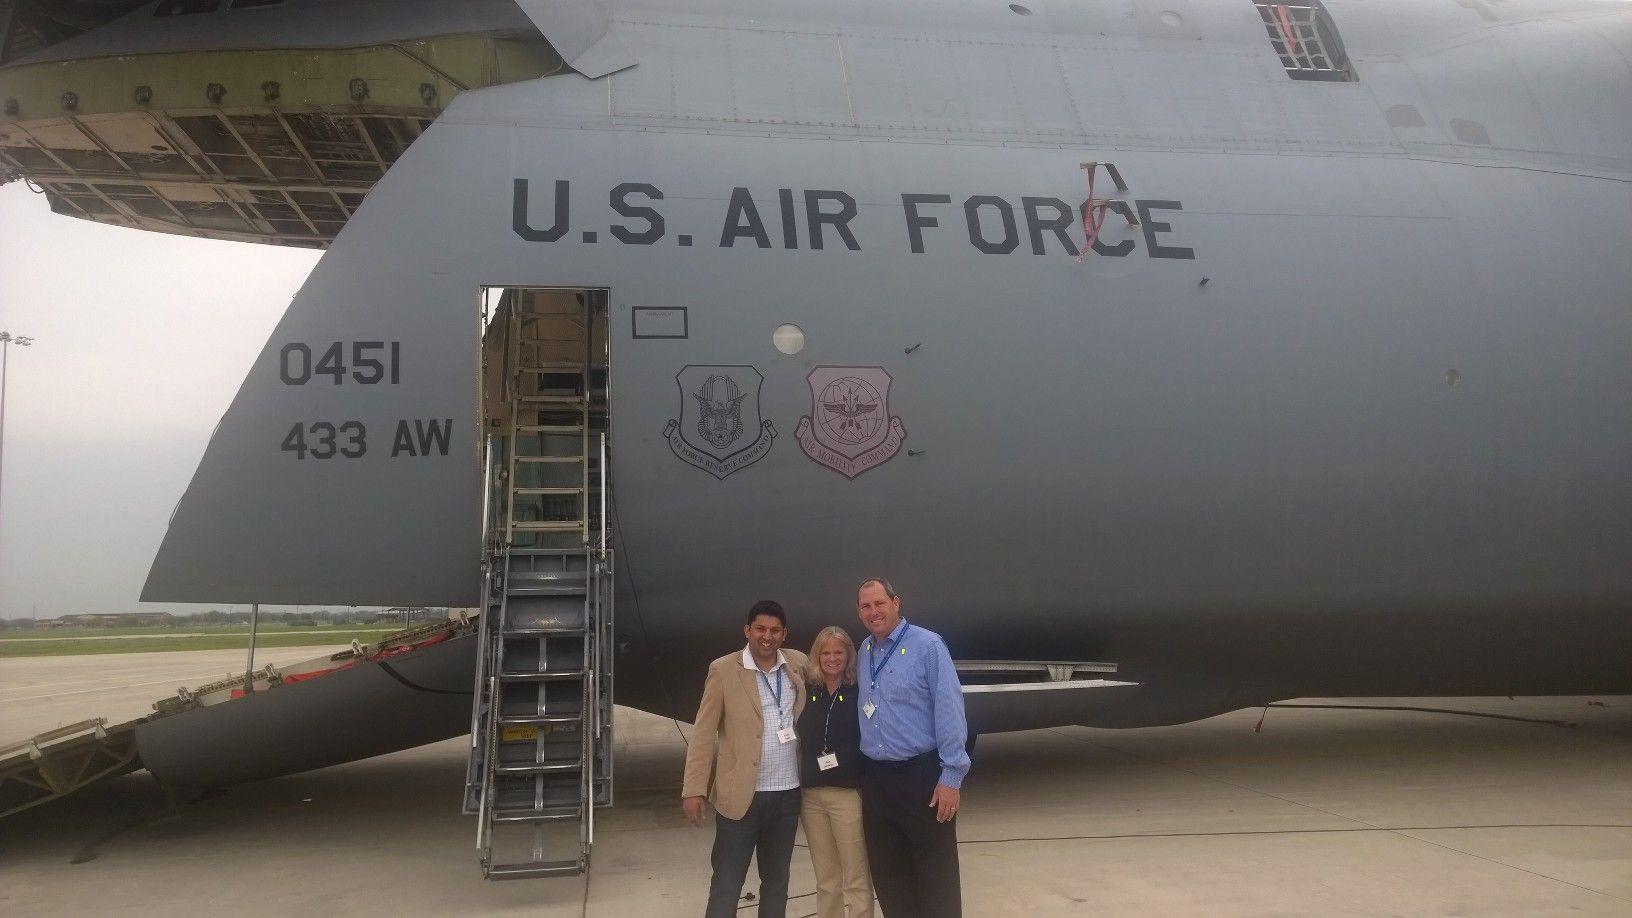 Having fun at MacDill Air Force Base with Civic Leaders of